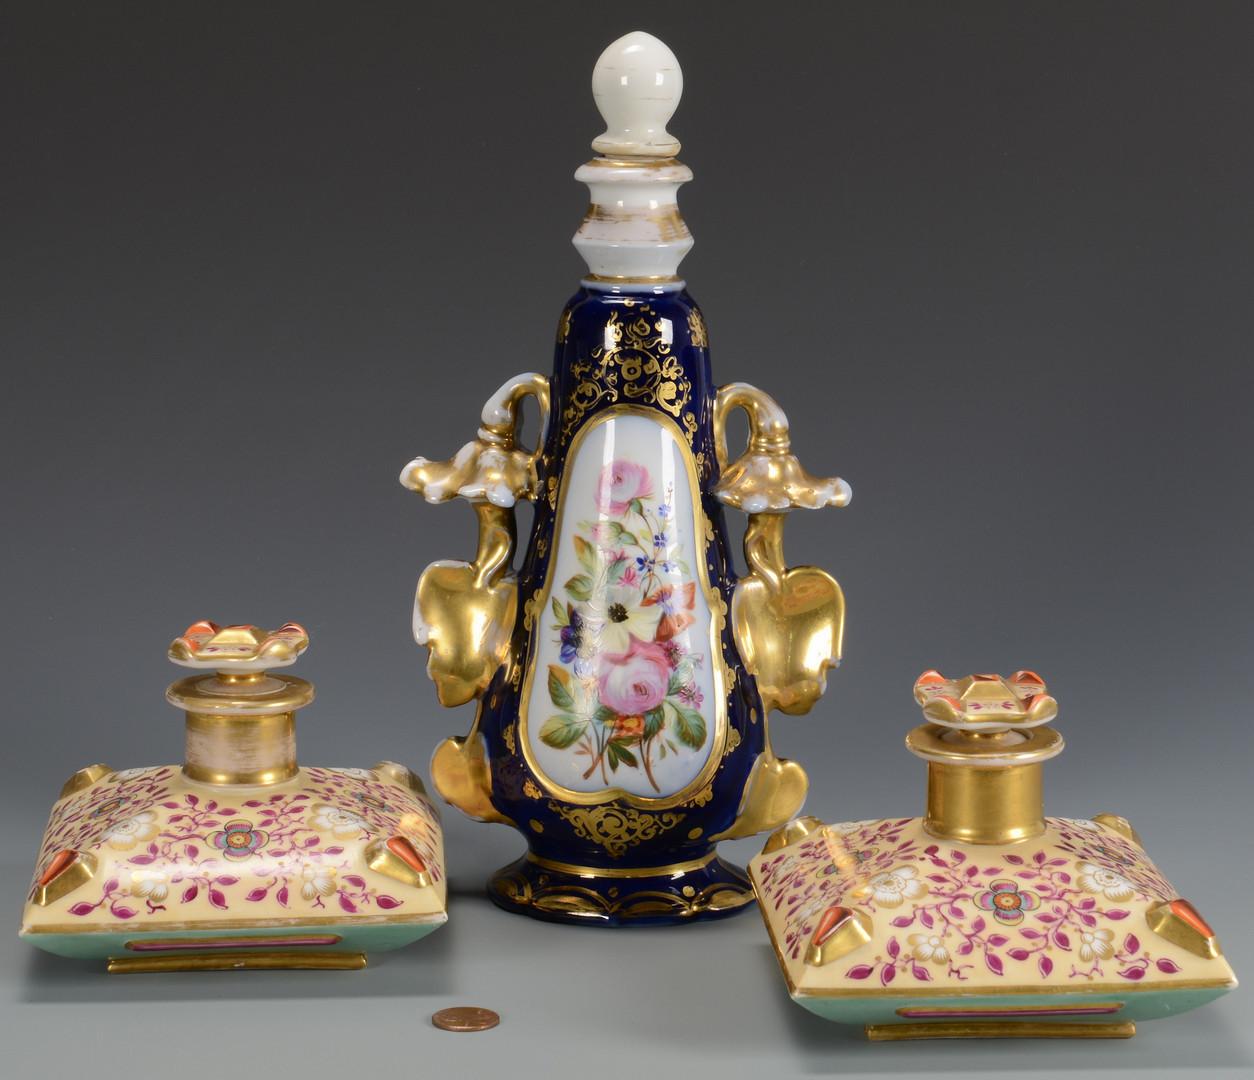 Lot 350: Old Paris Jars and Bottle, 3 items